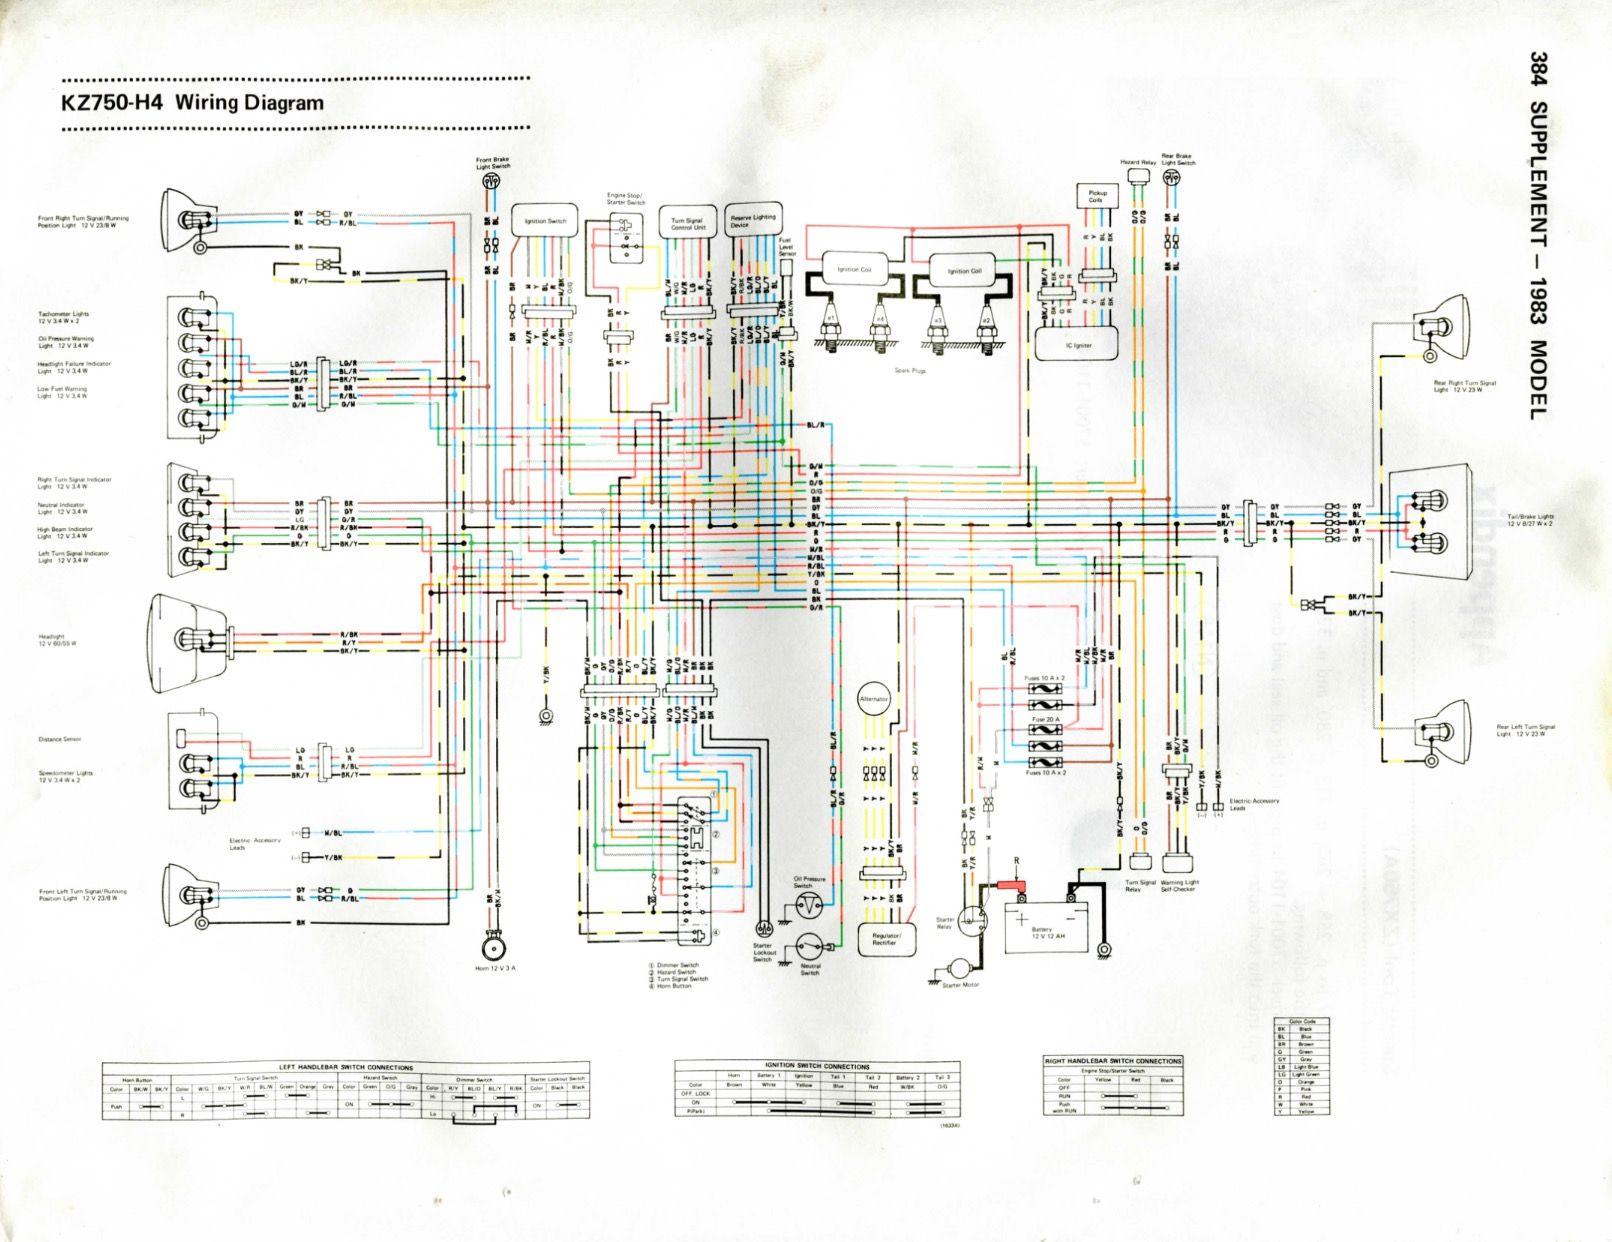 Kawasaki Kz750 Ltd Wiring Diagram Free Download Worksheet And Honda Xr 80 1980 Kz750g Wireing Trusted Rh Dafpods Co Suzuki Gs450